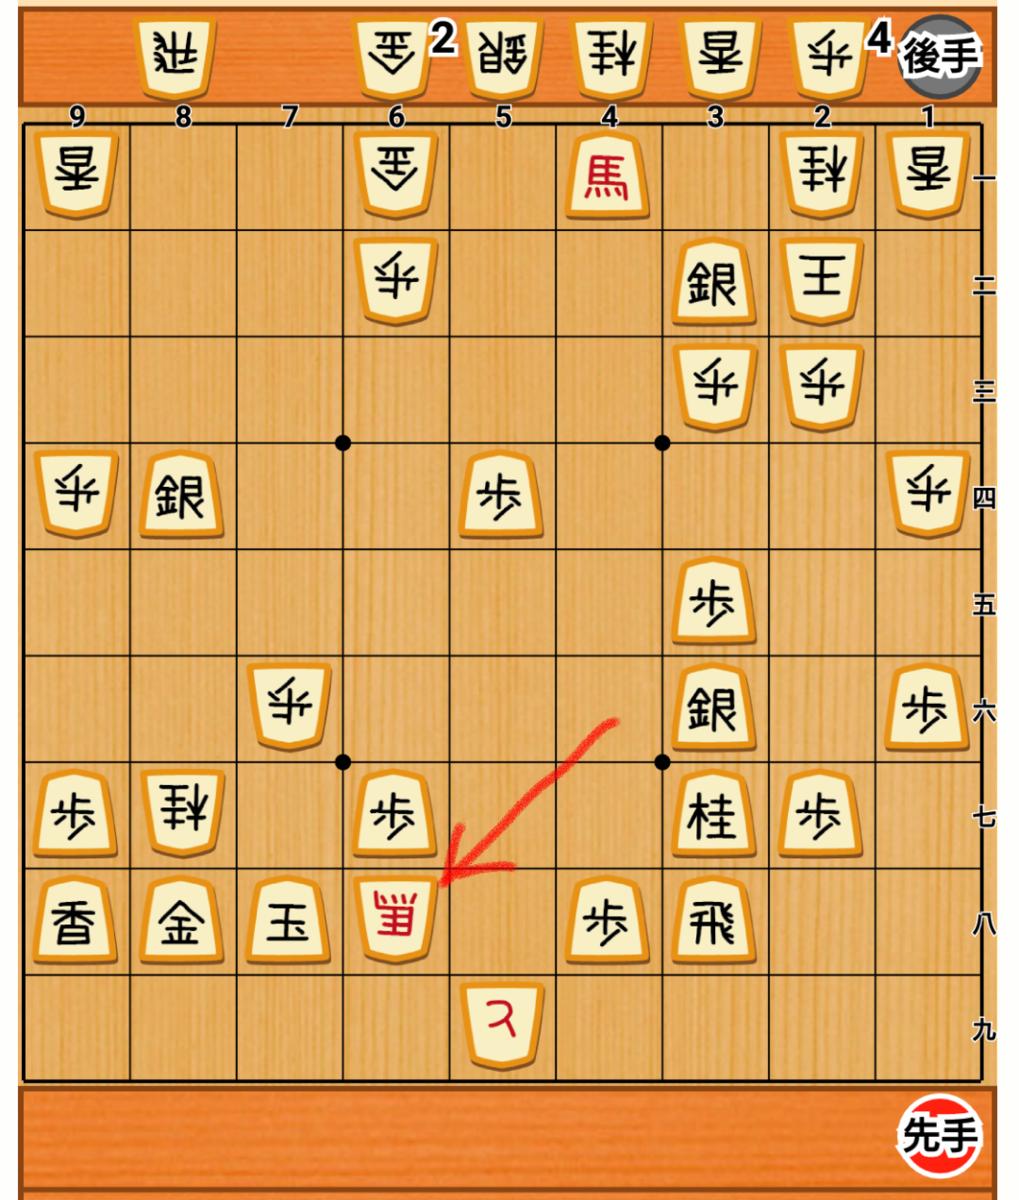 f:id:nao-shodan:20200530224154p:plain